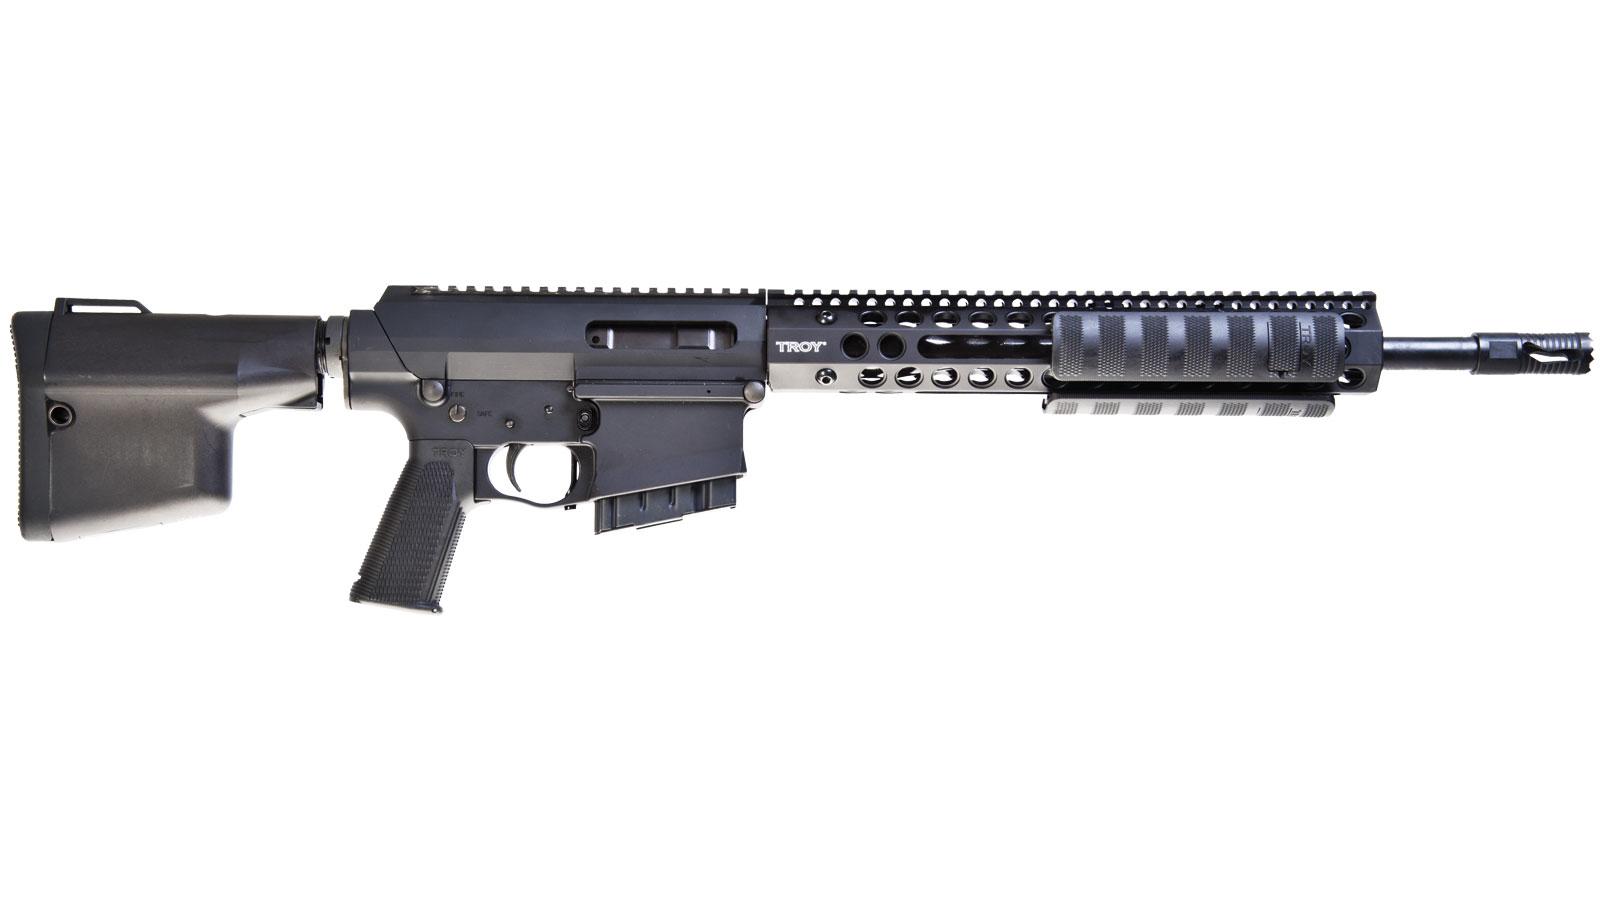 Troy SPARS3816BT PAR Pump Action Rifle 308|7.62 16 10+1 Fxd CQB Stk Blk in.